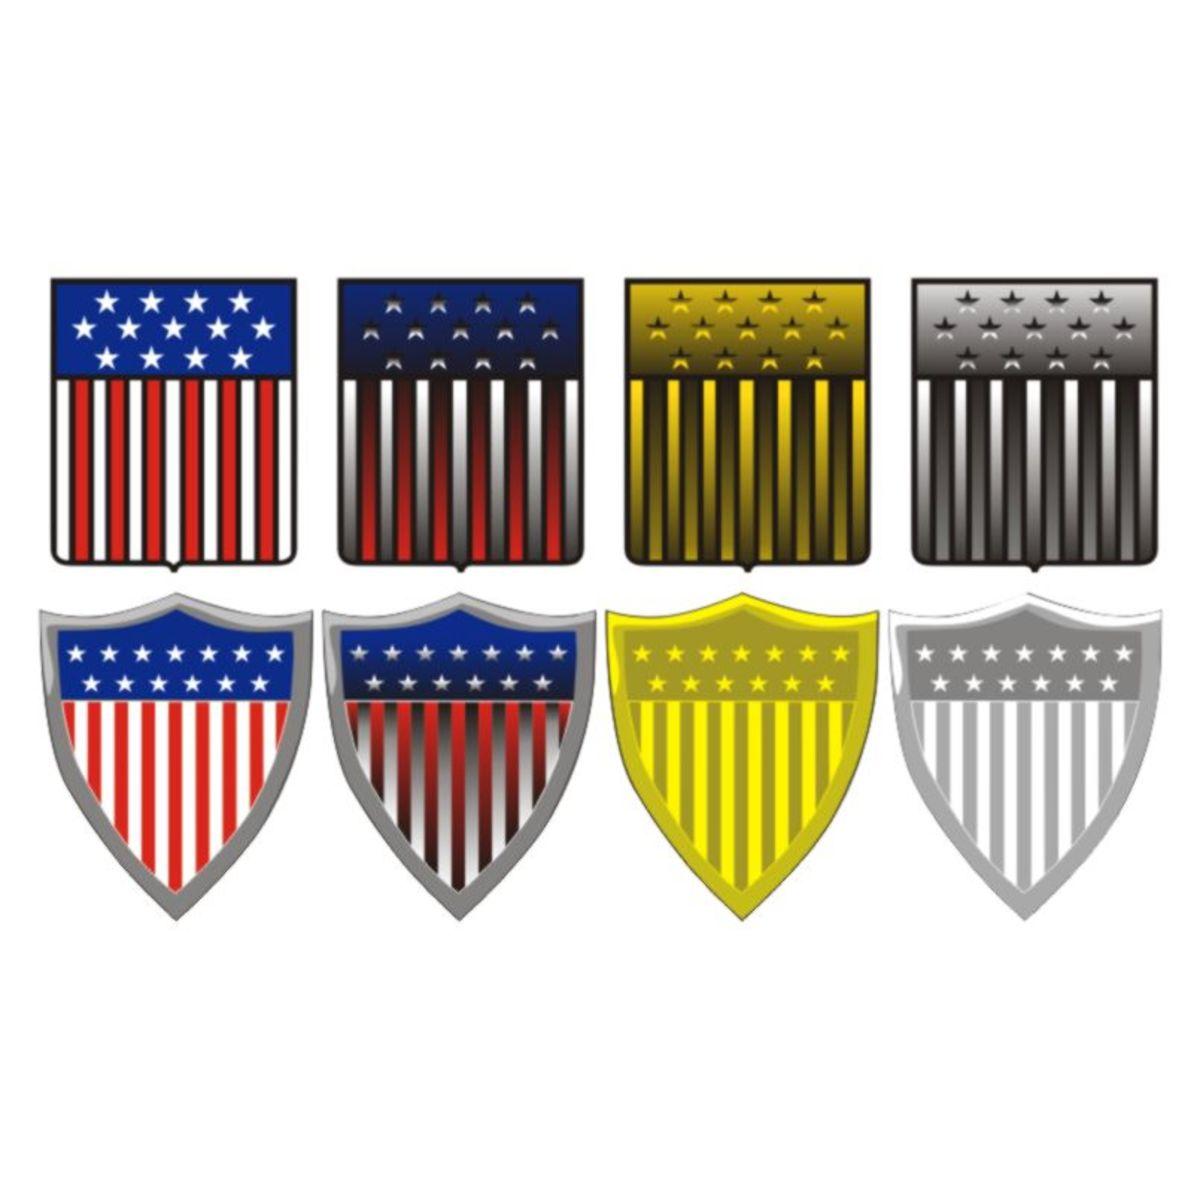 U.S. Shields vectored.